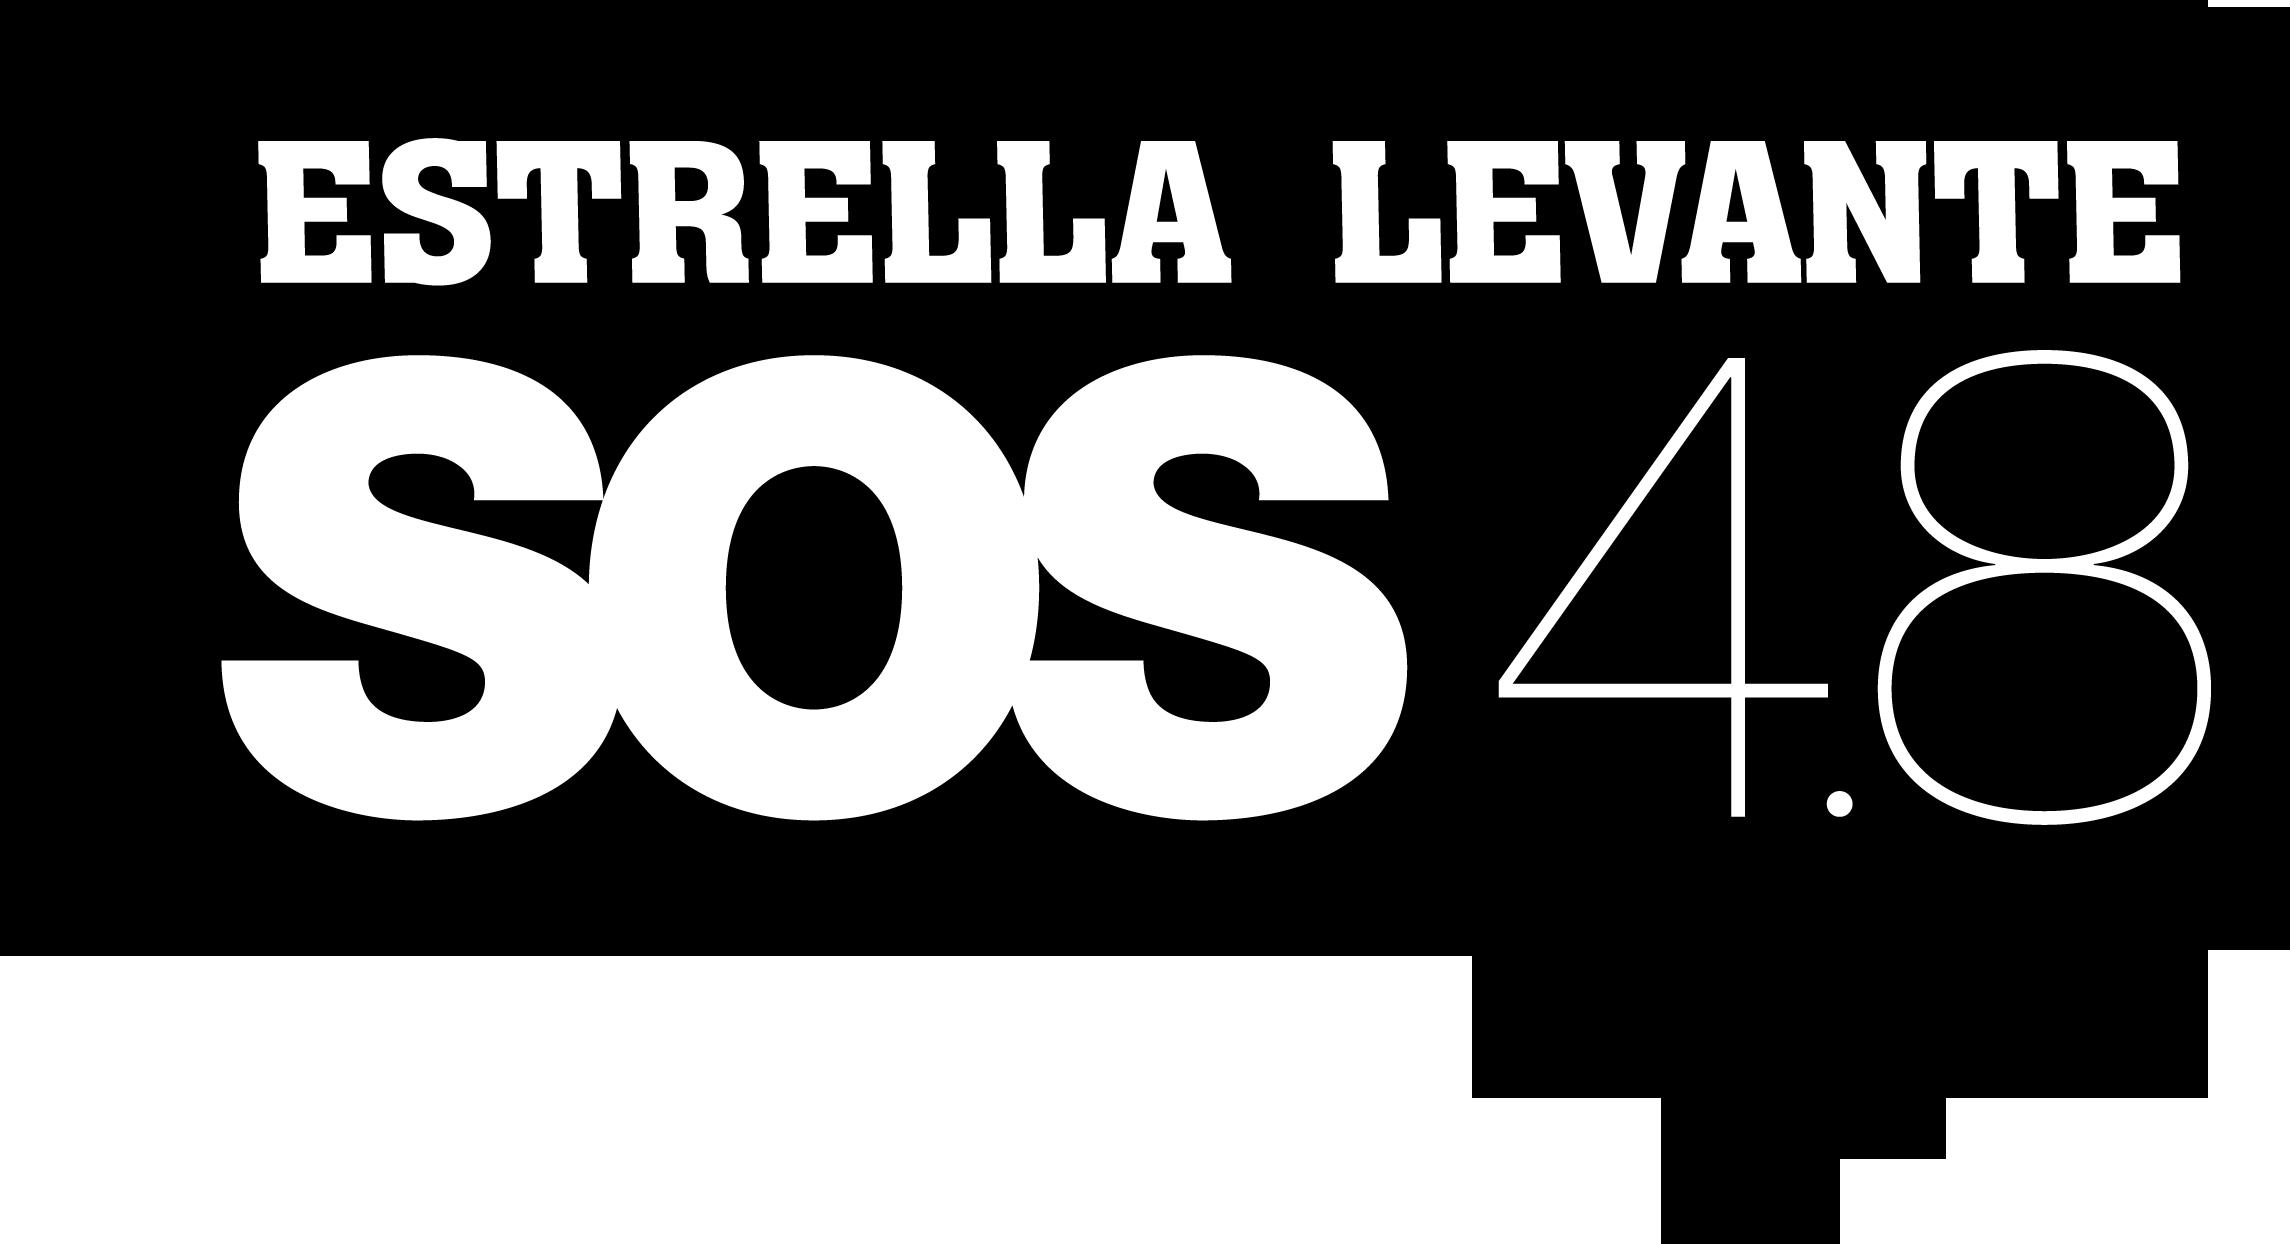 Estrella de Levante SOS 4.8 Murcia 2014